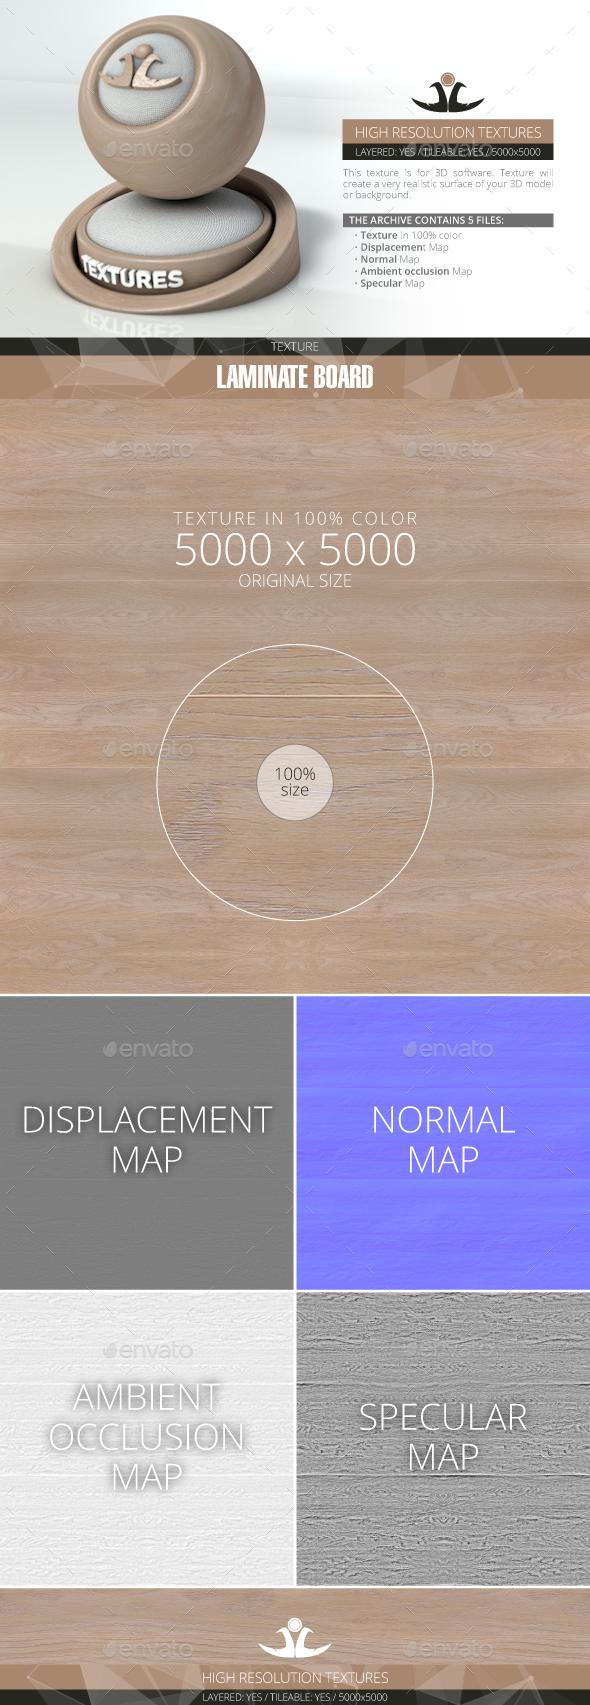 Laminate board 2 - 3DOcean Item for Sale